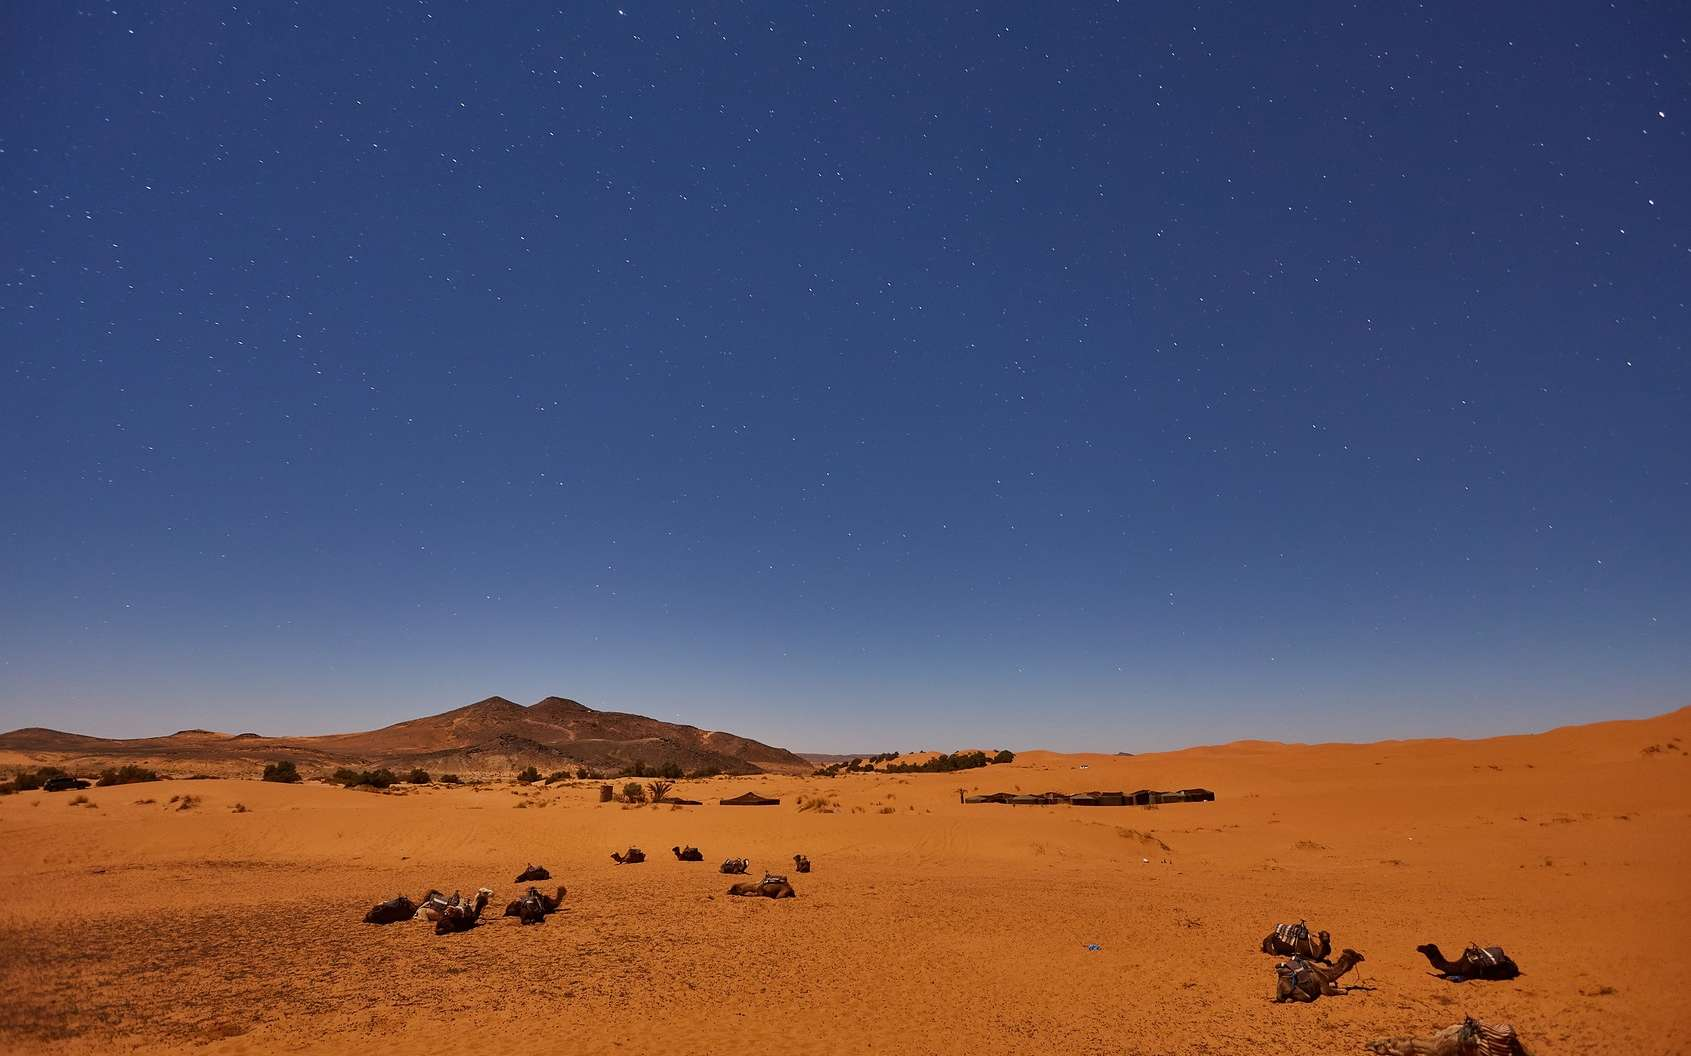 Le désert du Sahara a grandi de 10 % en 93 ans. © Saharrr, Fotolia